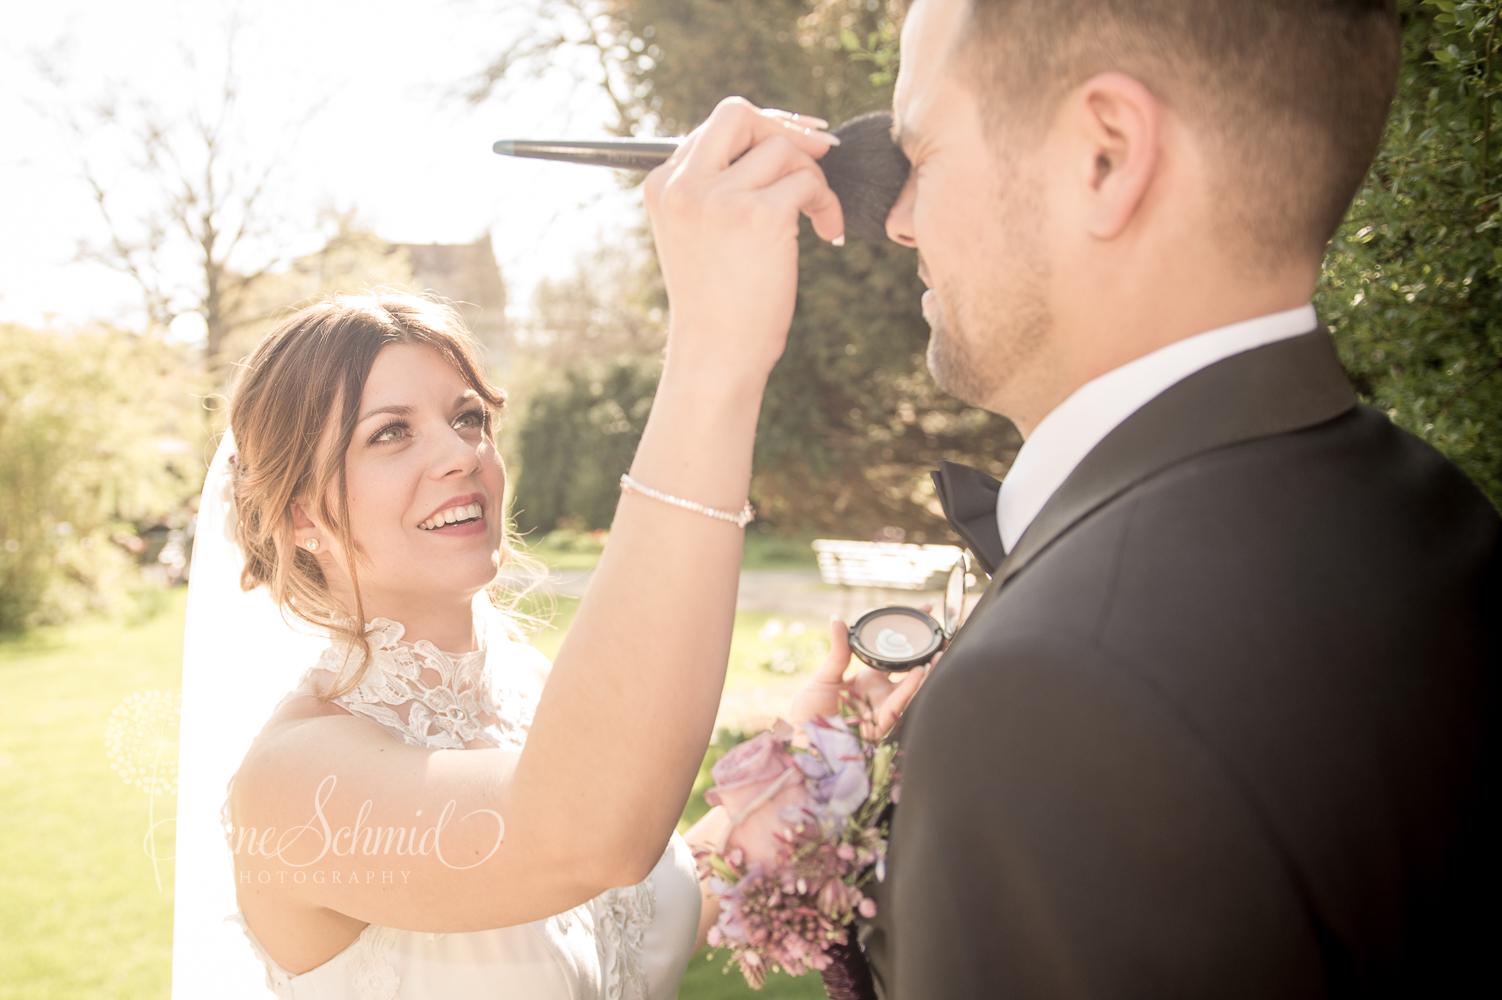 Hochzeitsfotografin Irene Schmid aus Winterthur